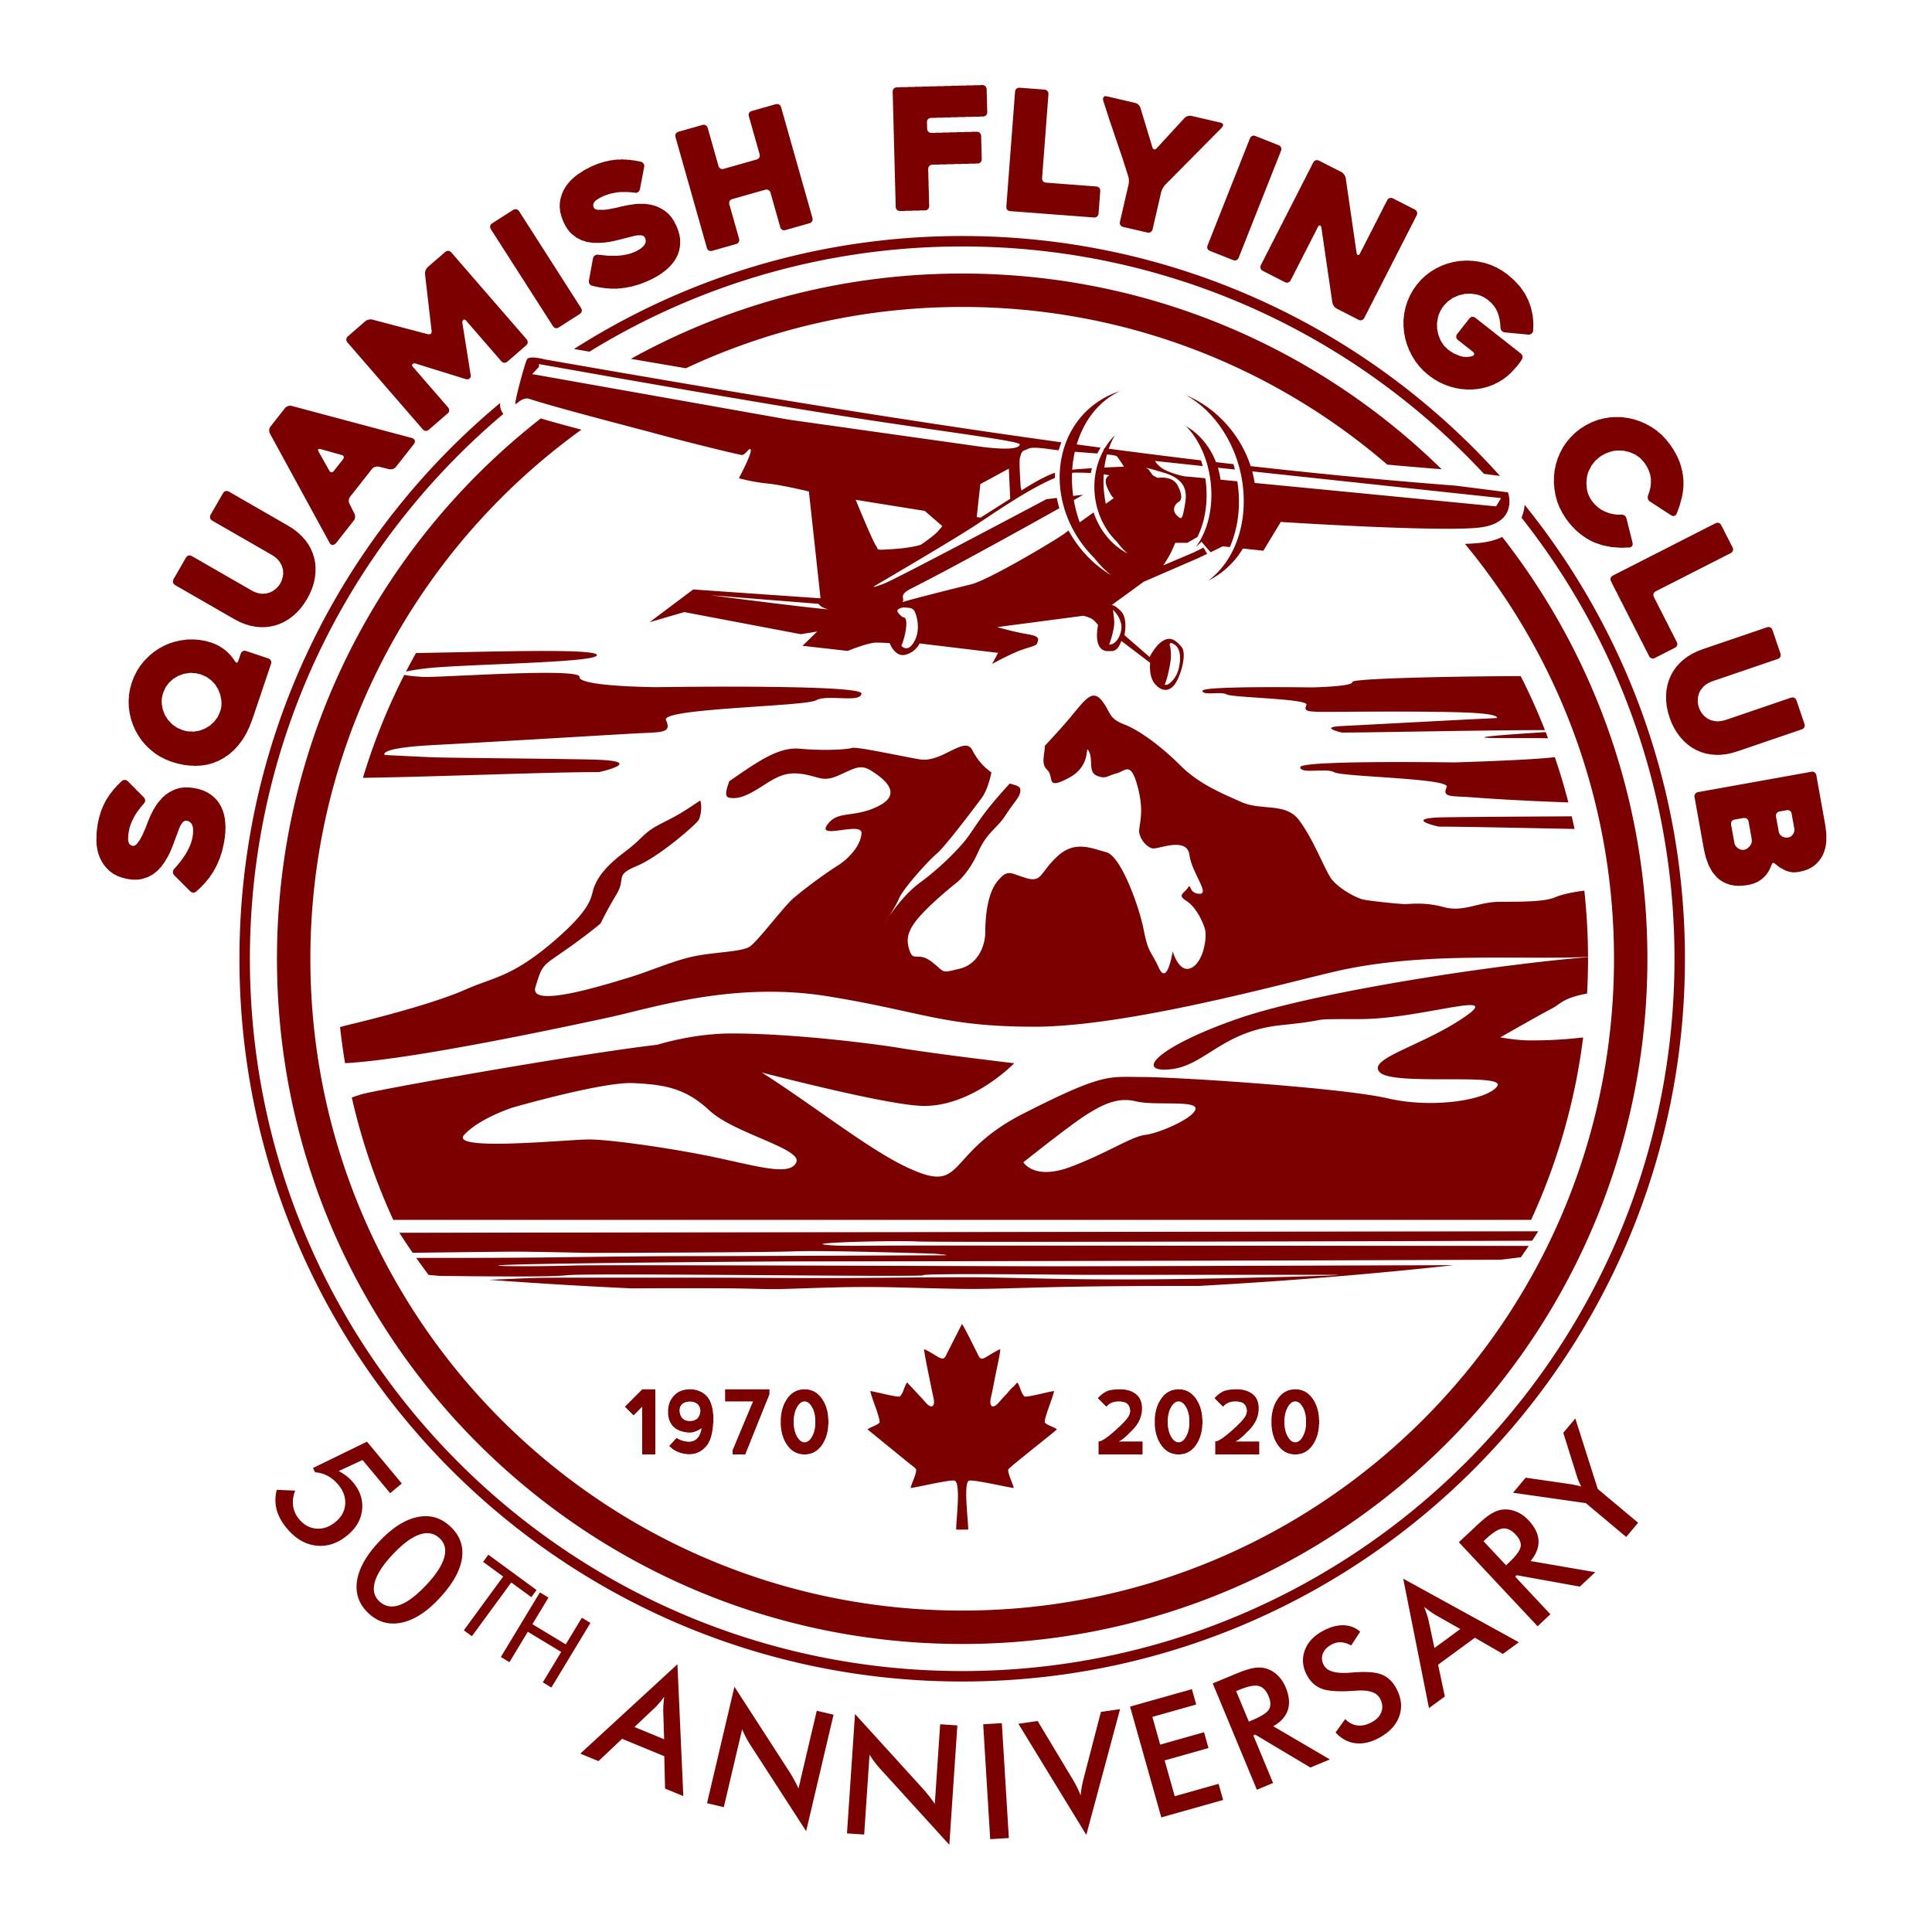 Squamish Flying Club logo & 50th anniversary